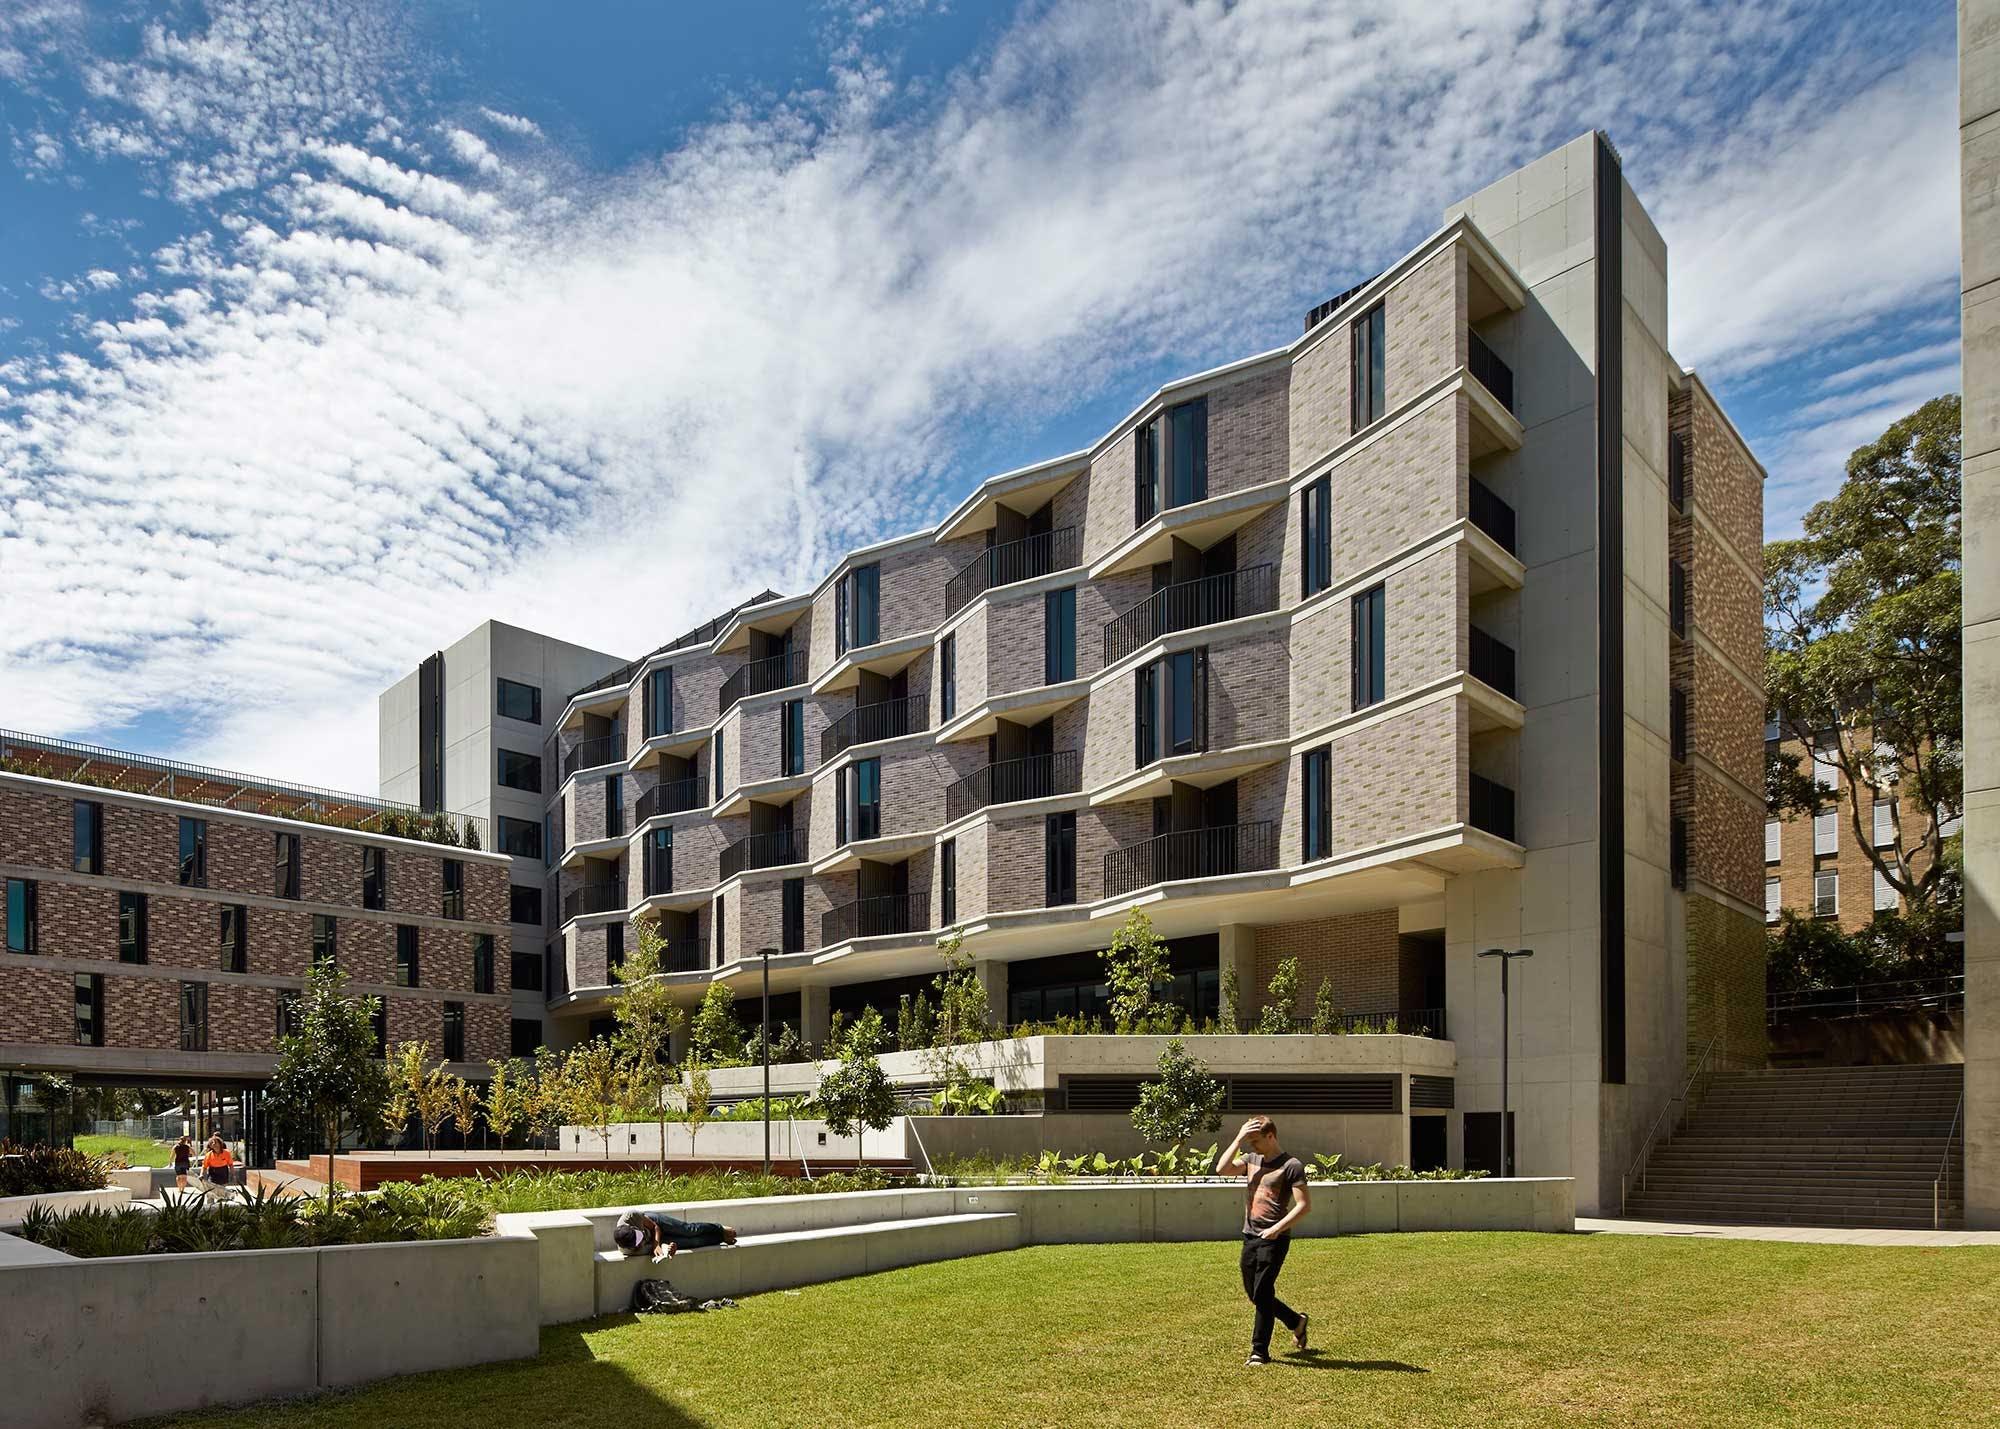 UNSW Kensington Colleges